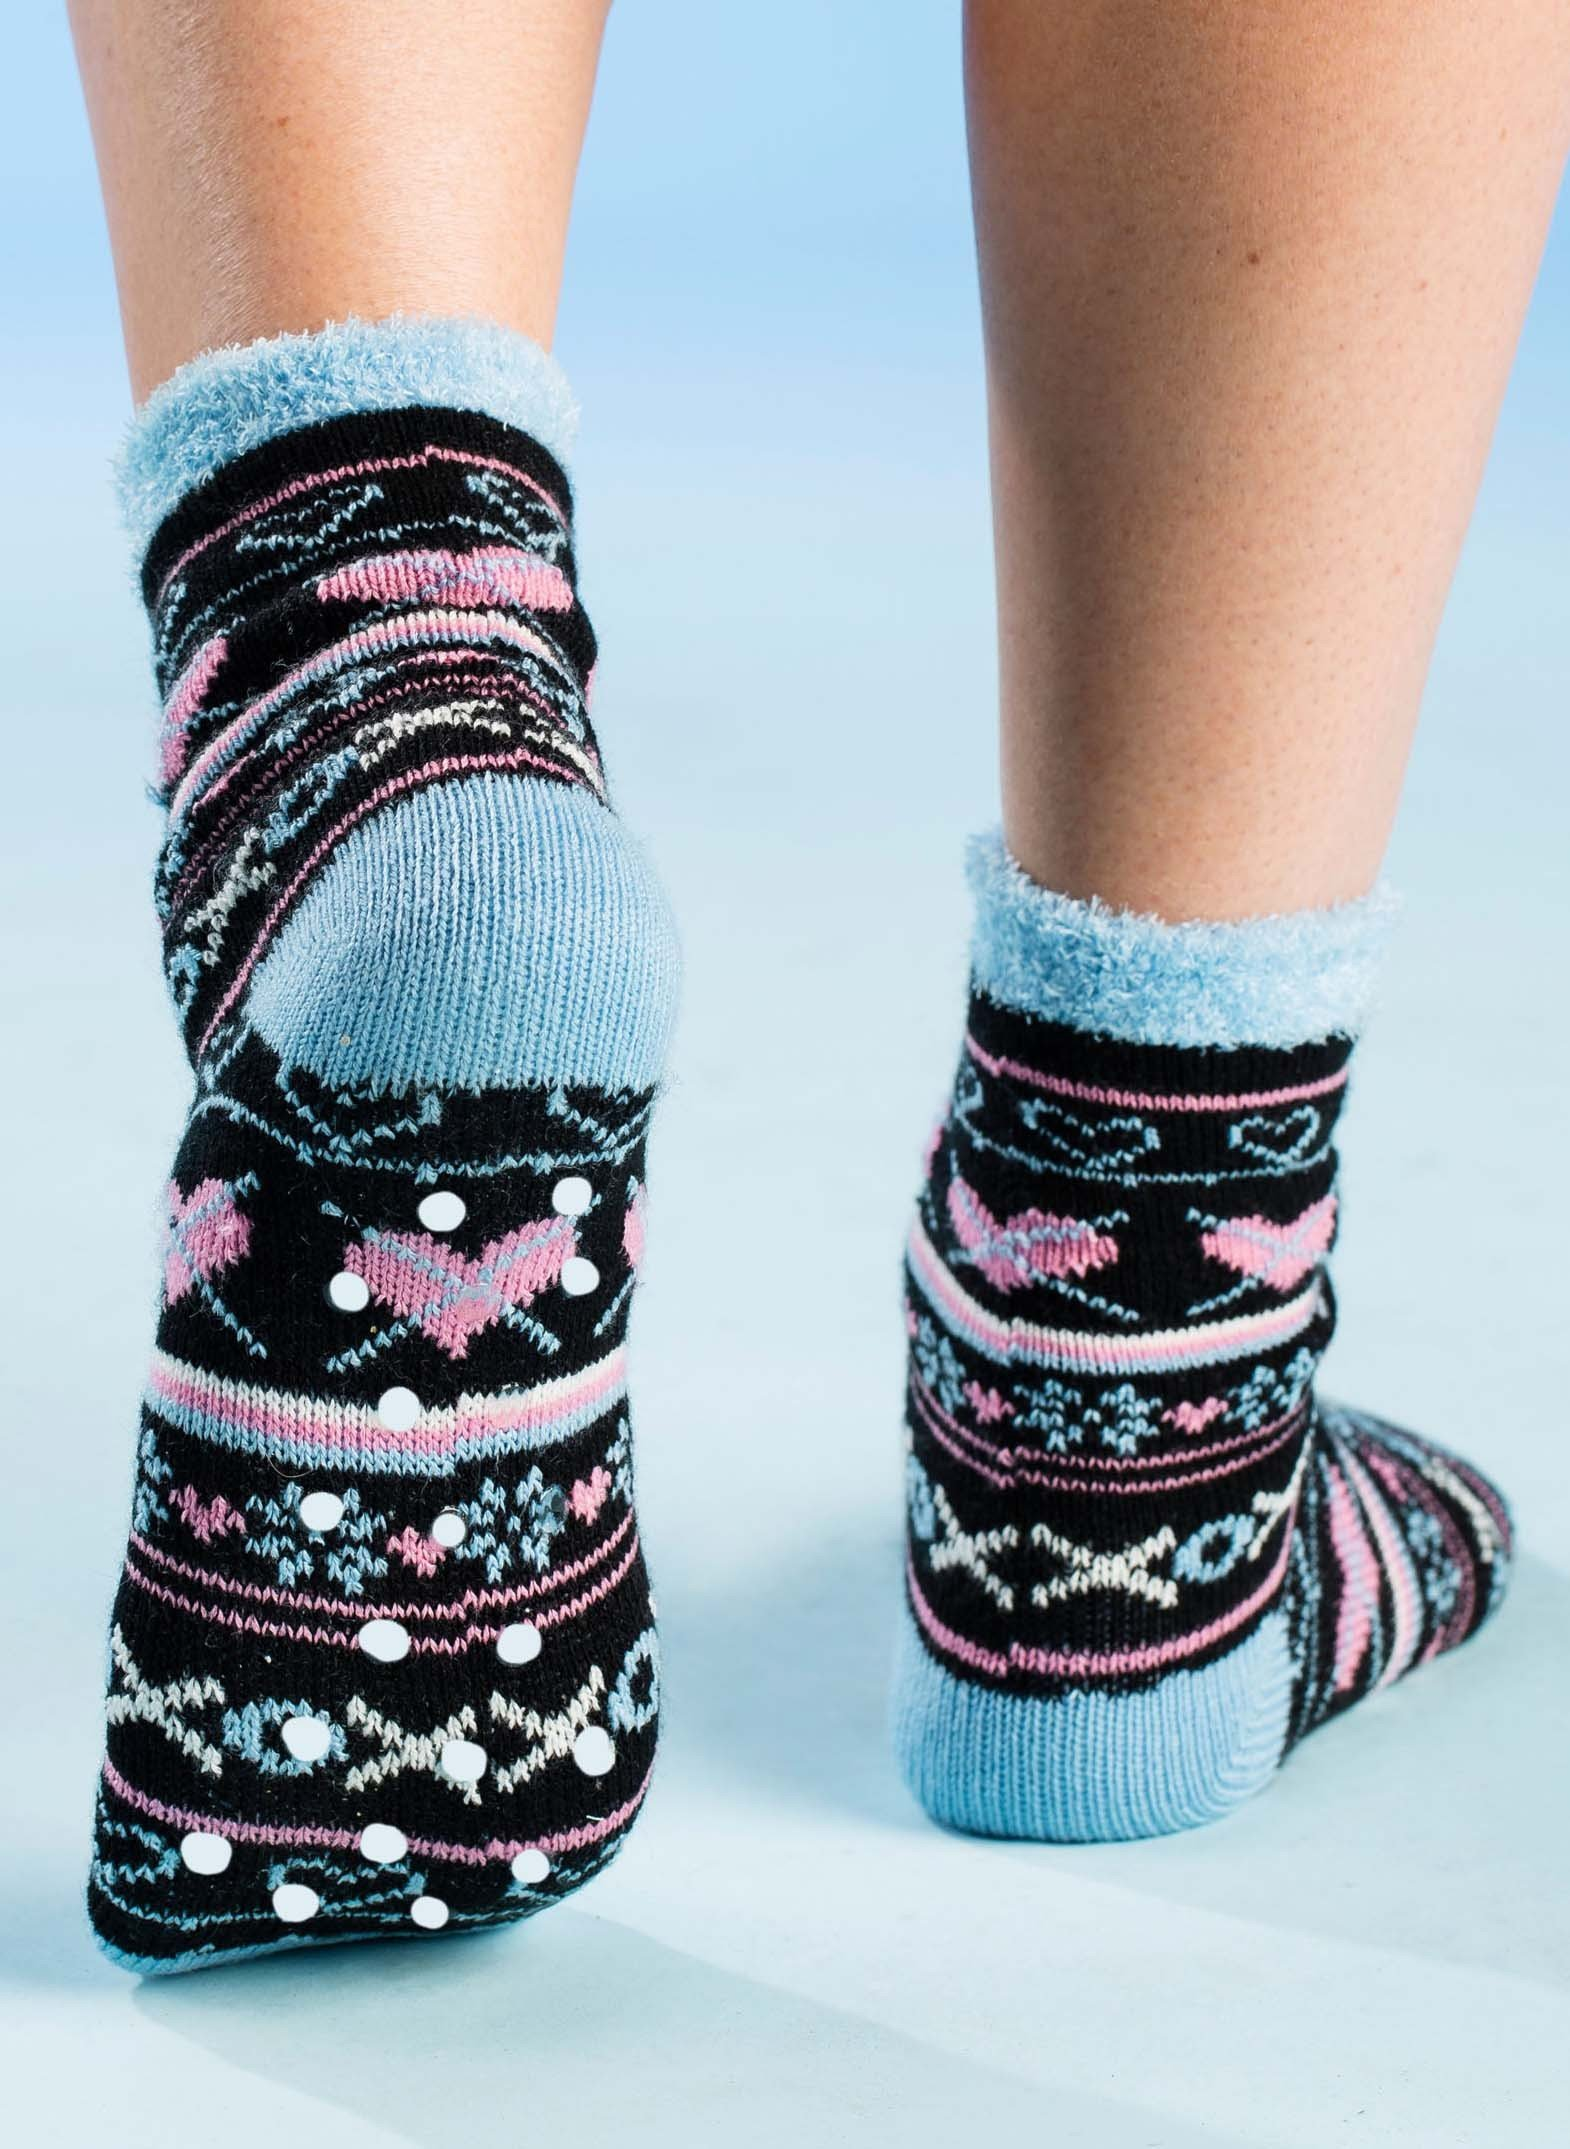 D-Haus-Socken,3er-S.ciel/pink 3538 051